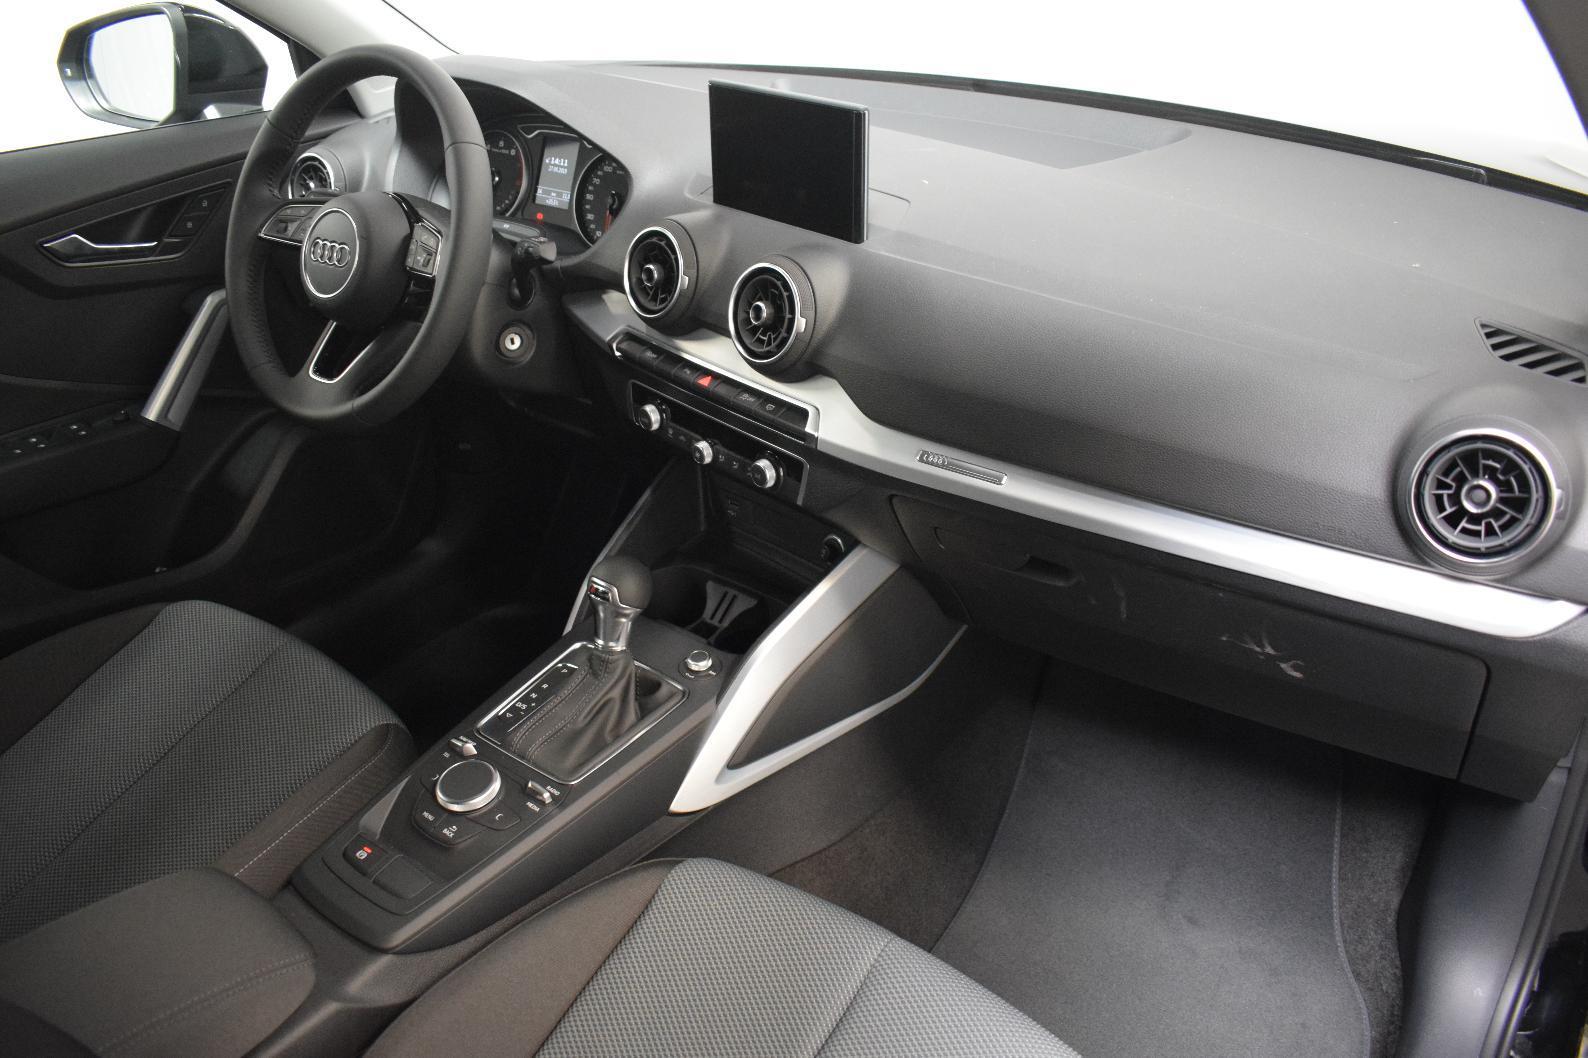 AUDI Q2 35 TFSI COD 150 S tronic 7 Design